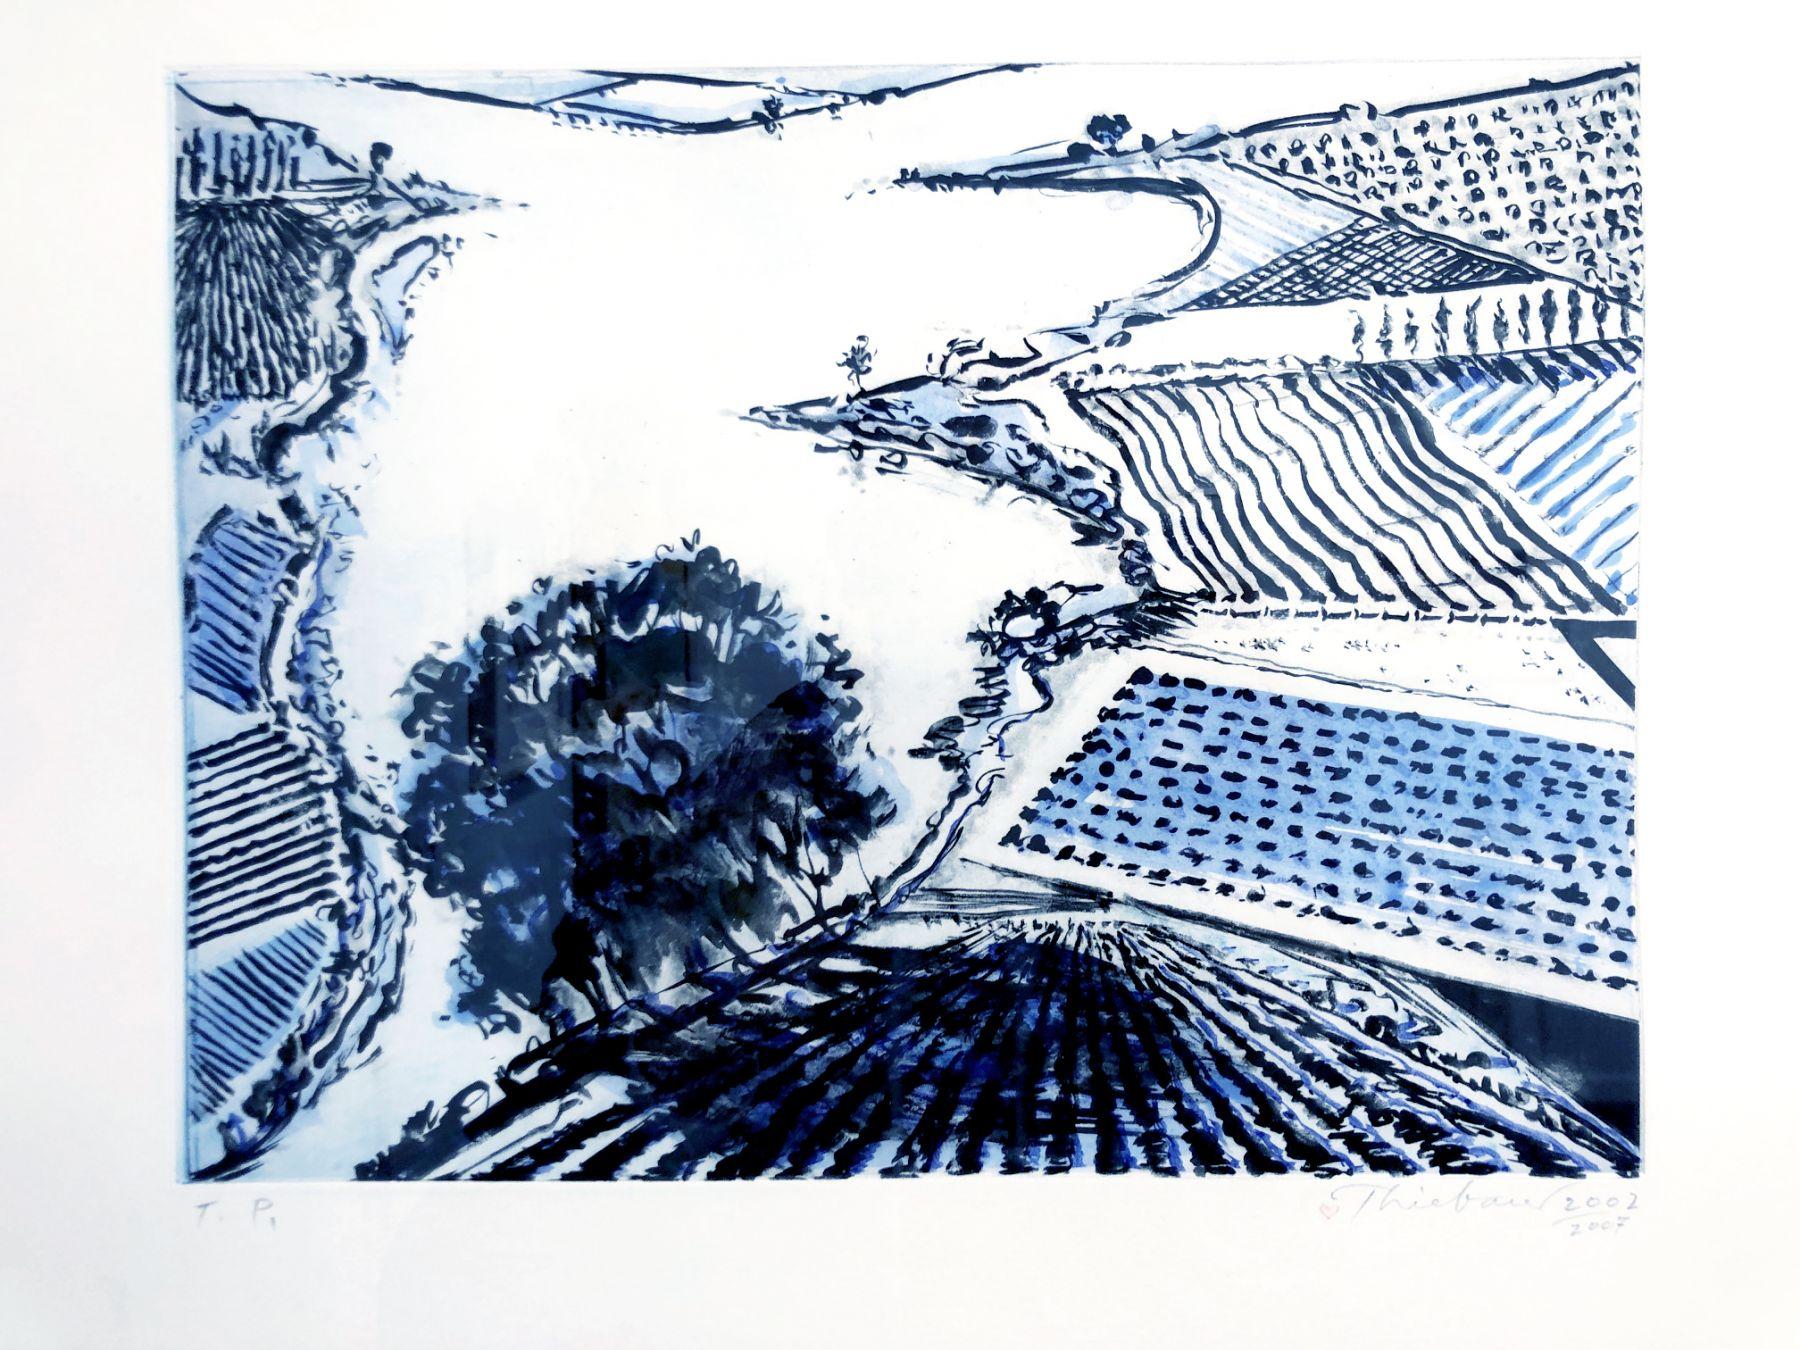 Wayne Thiebaud, River and Farms, 2002-2007